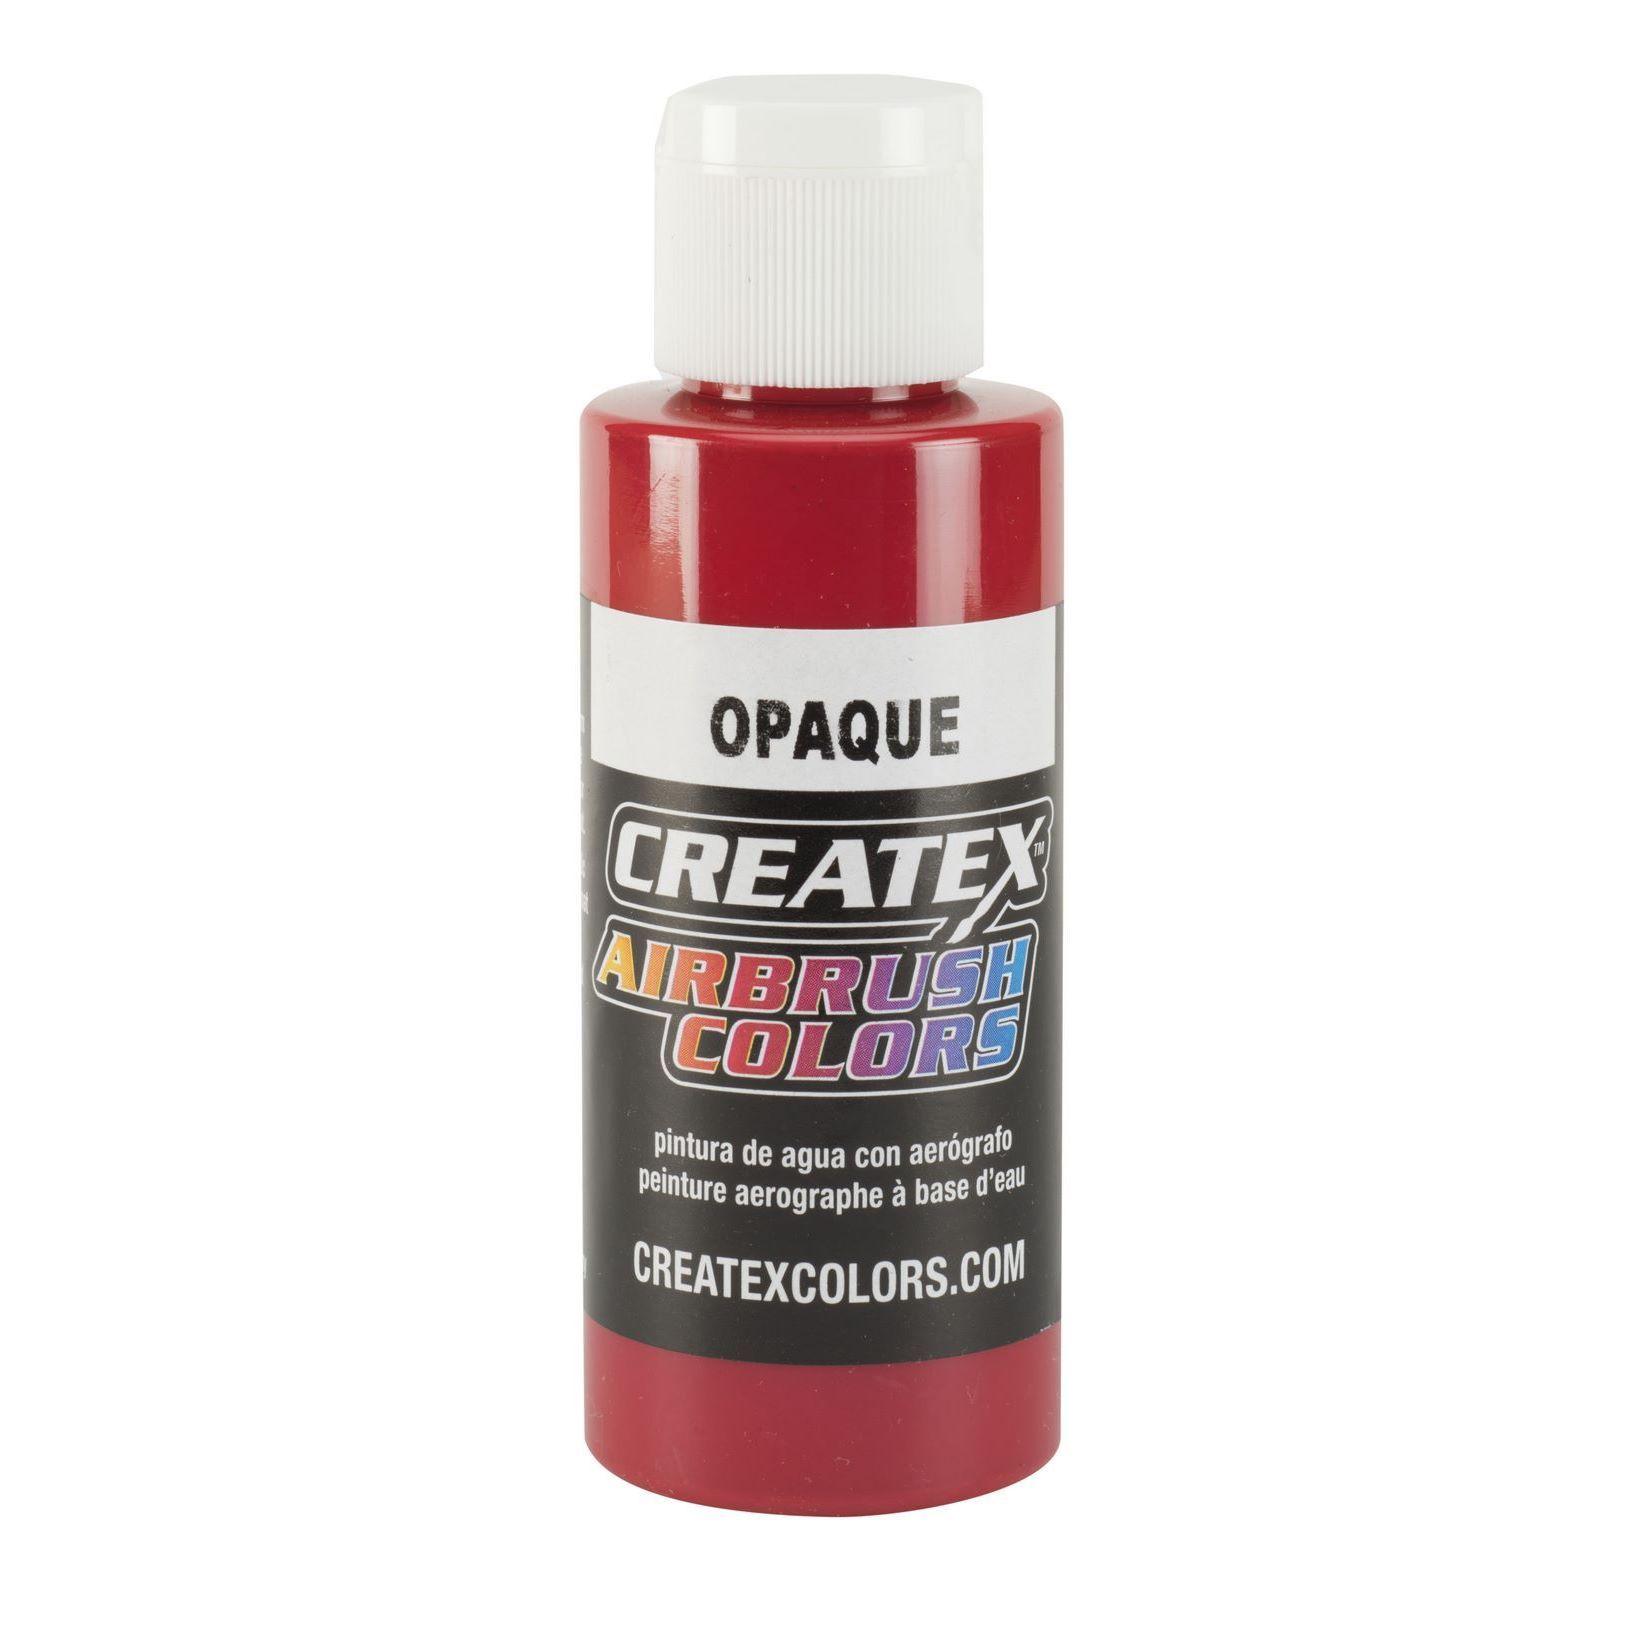 opaque red Createx Airbrush Colors Farbe 120ml 12 5210 Createx